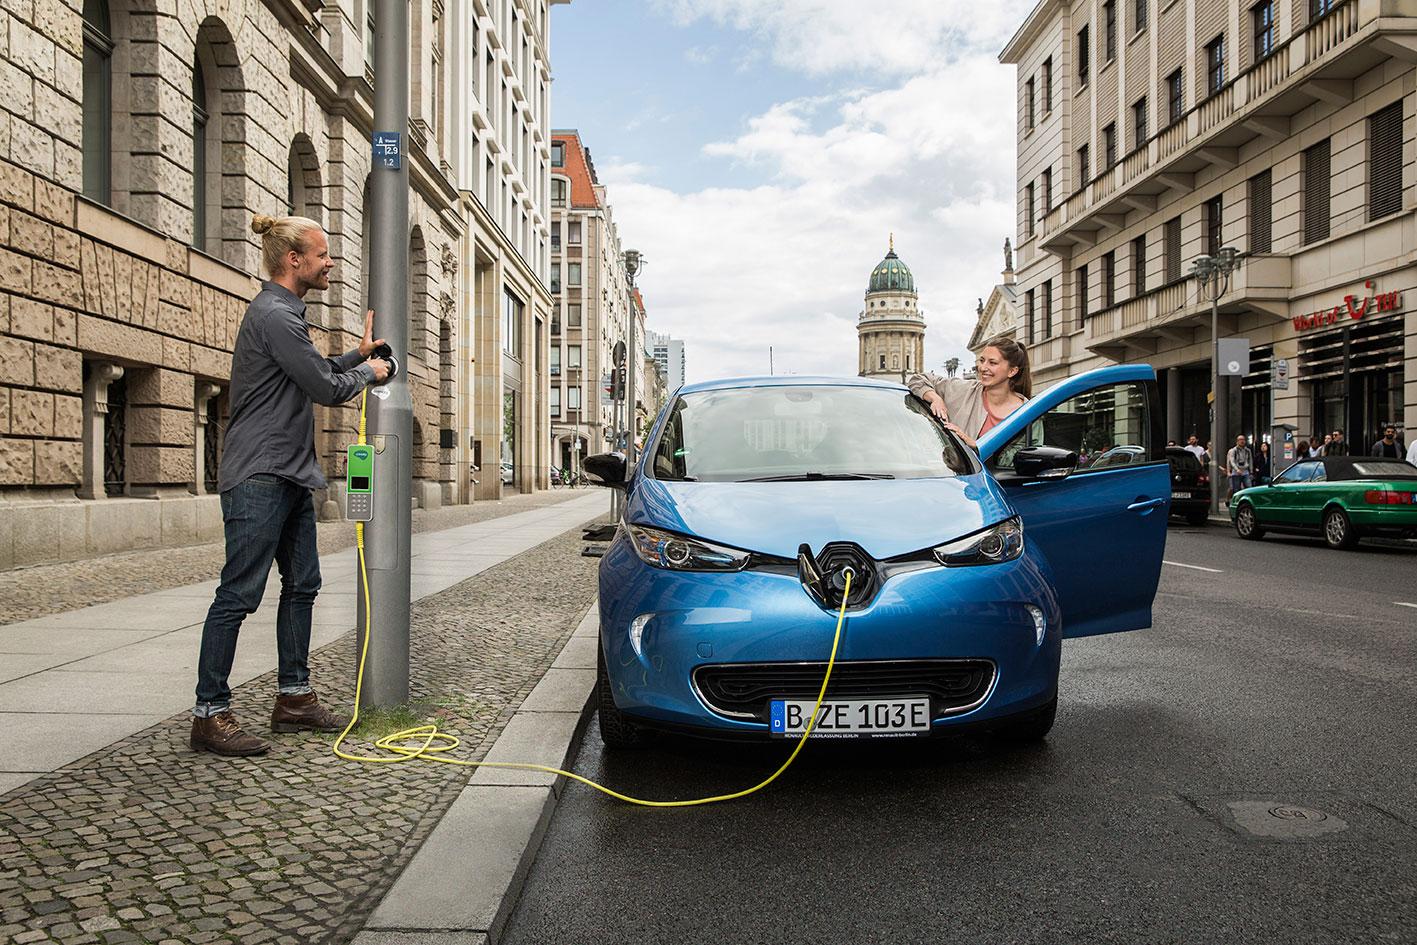 E-Auto an der Straßenlaterne laden – geht das? » smarter-fahren.de